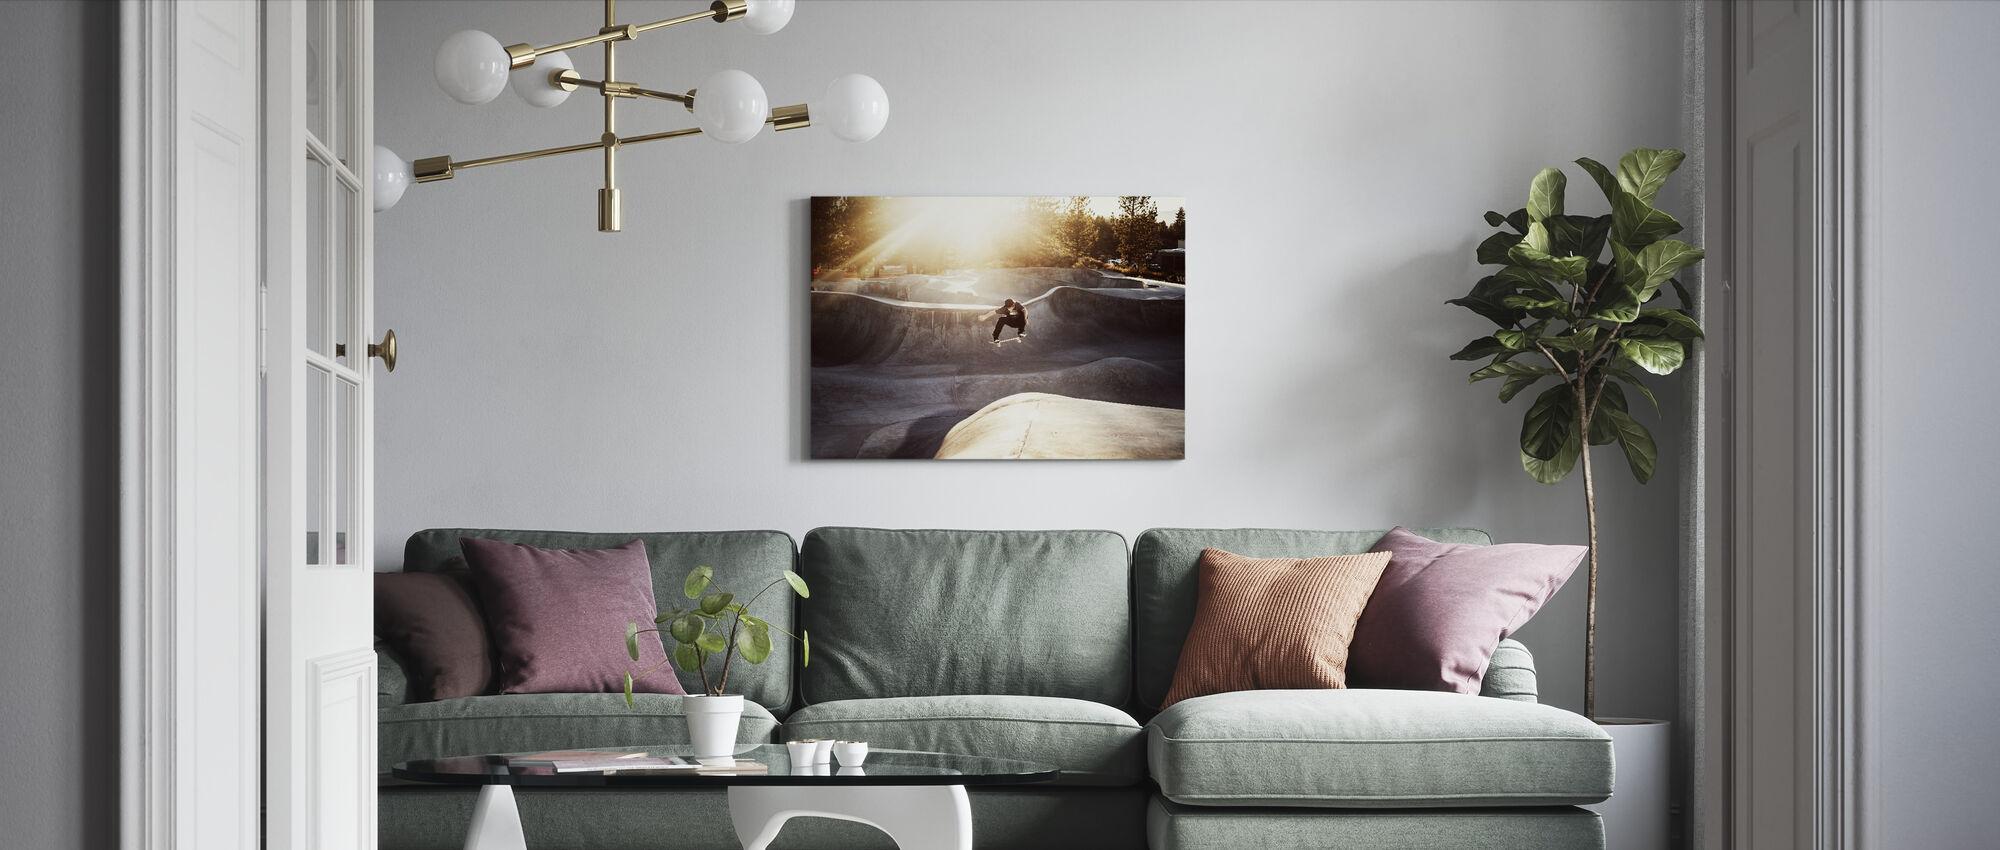 Skateboard Park - Canvas print - Living Room